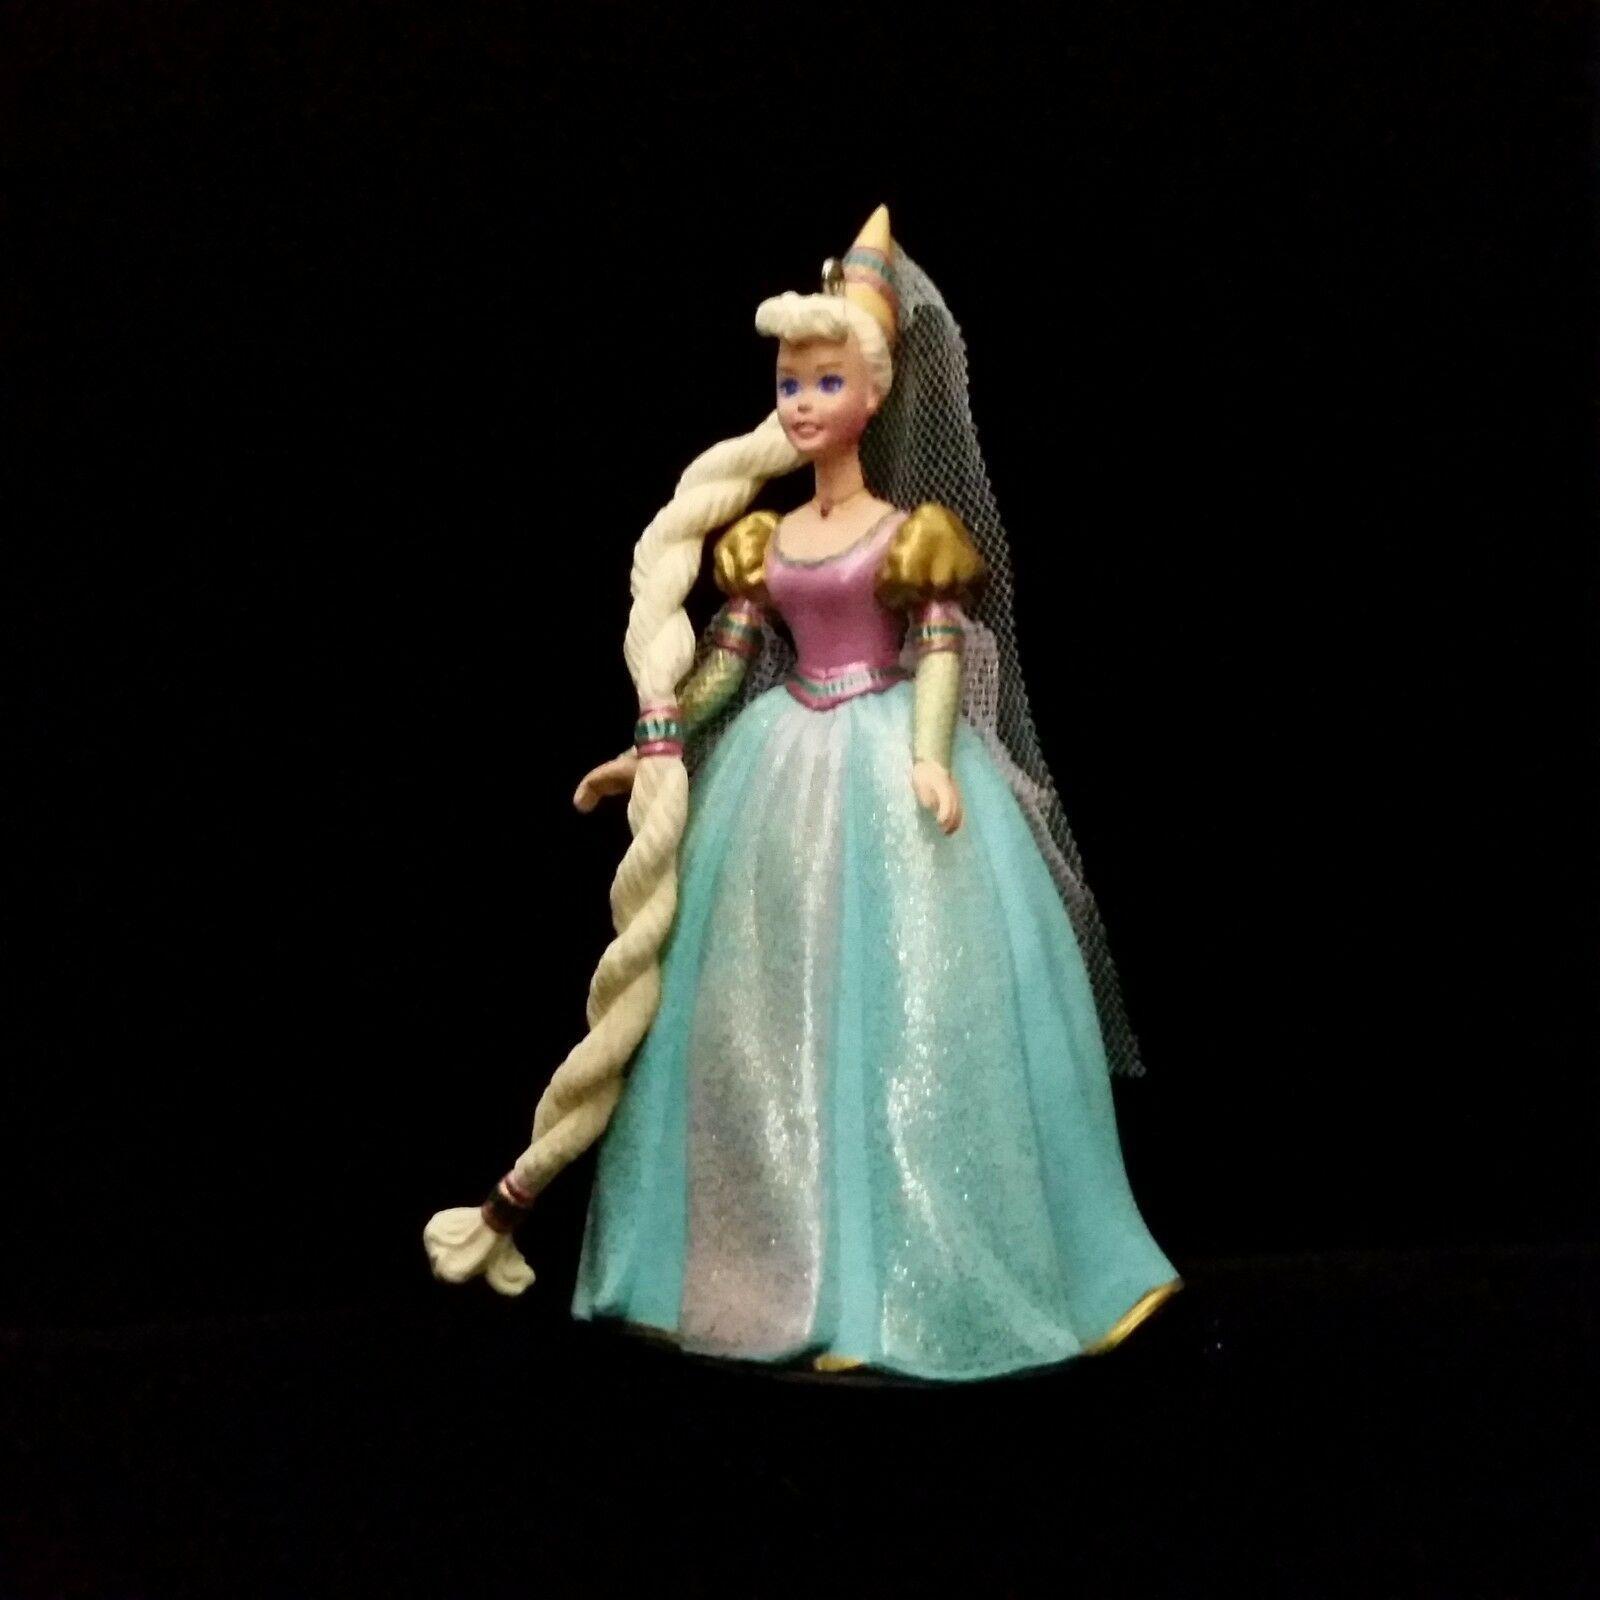 Rapunzel Barbie Ornament Christmas Hallmark Keepsake Children's Series 1997